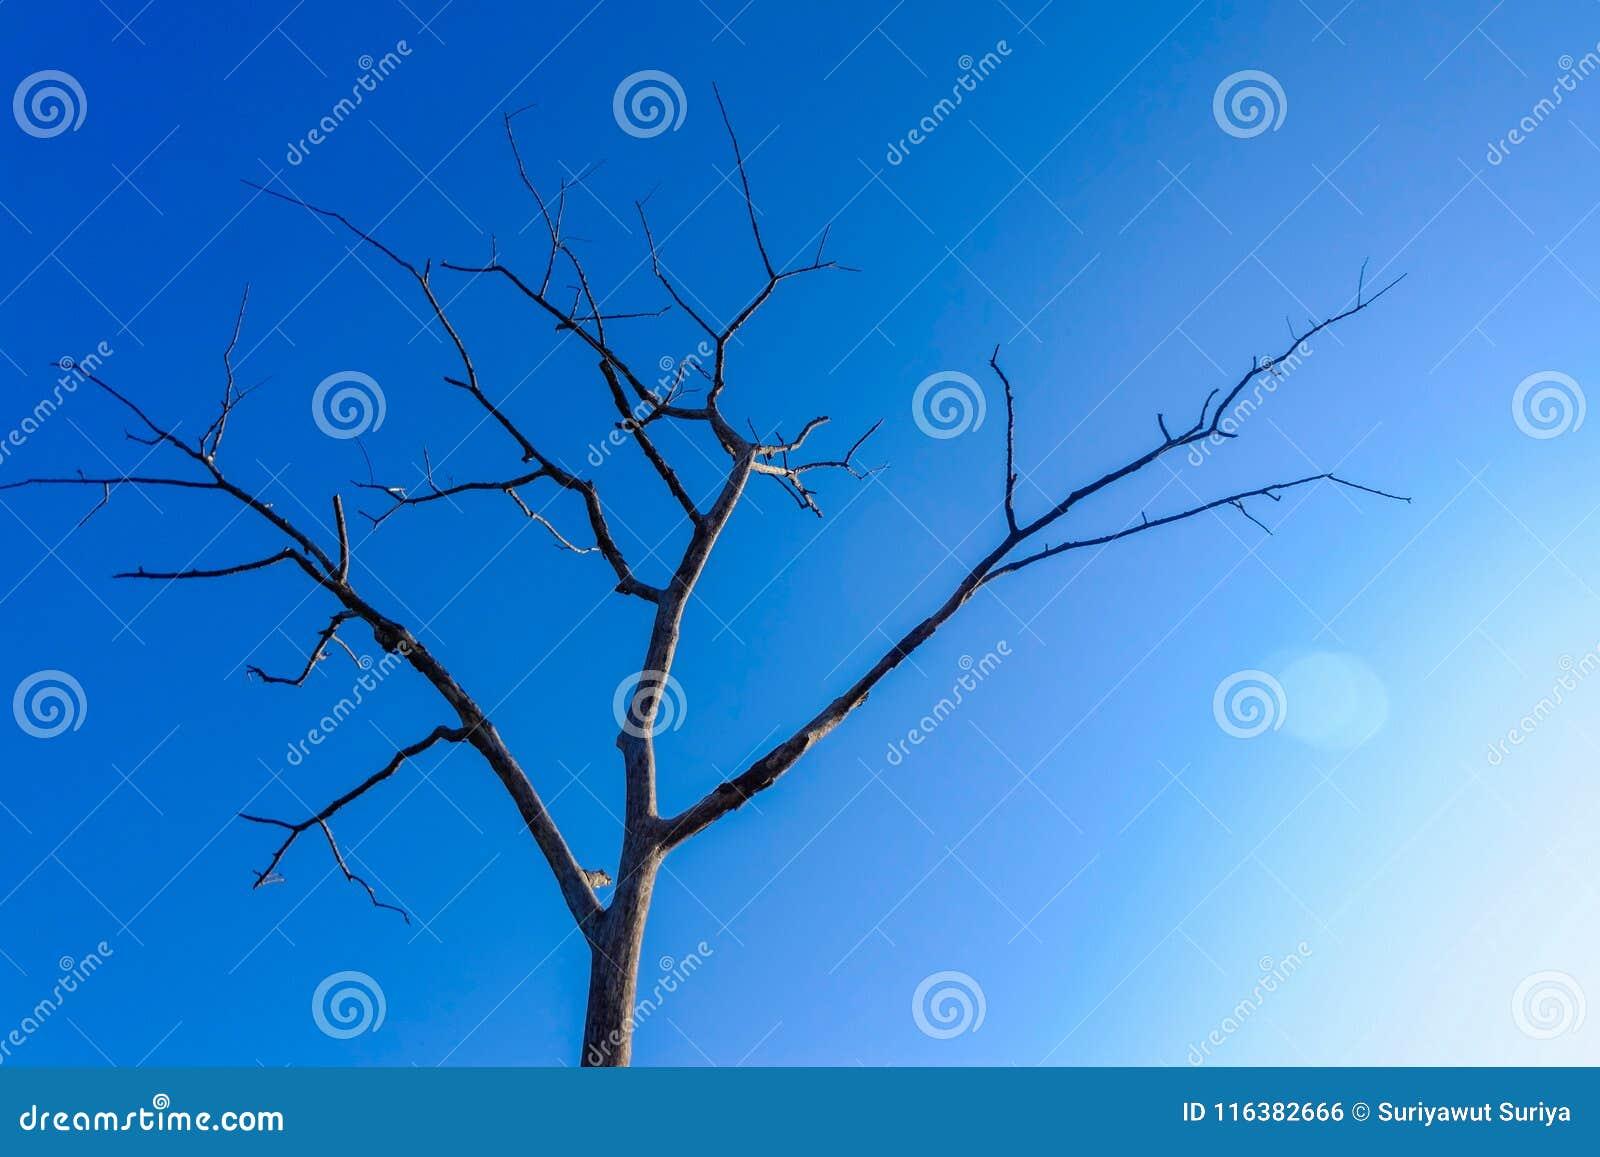 Arbre sec mort sur le ciel bleu La mort et concept vivant